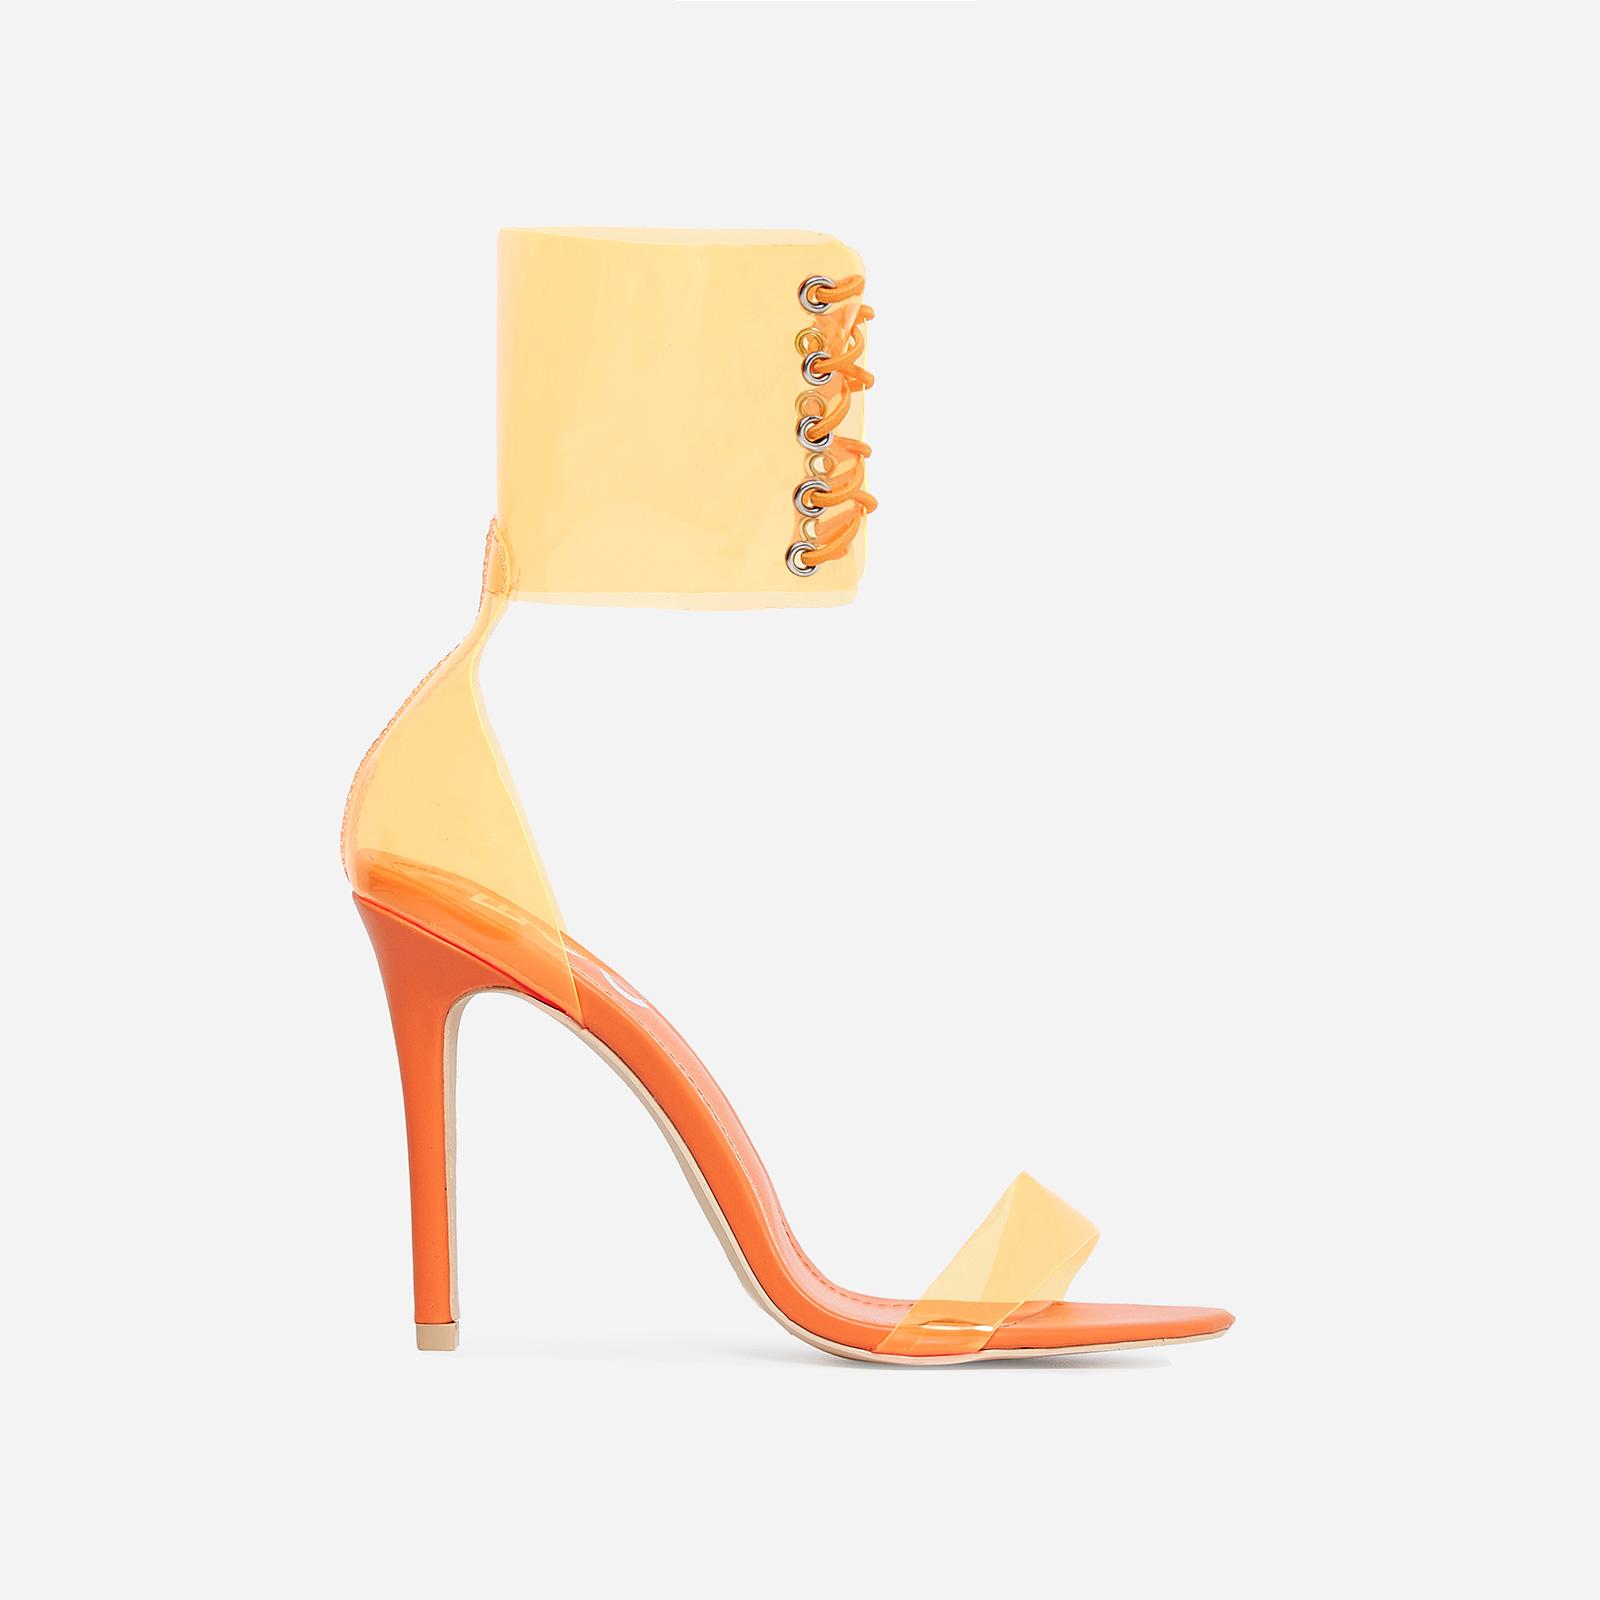 Passion Lace Up Perspex Heel In Orange Patent